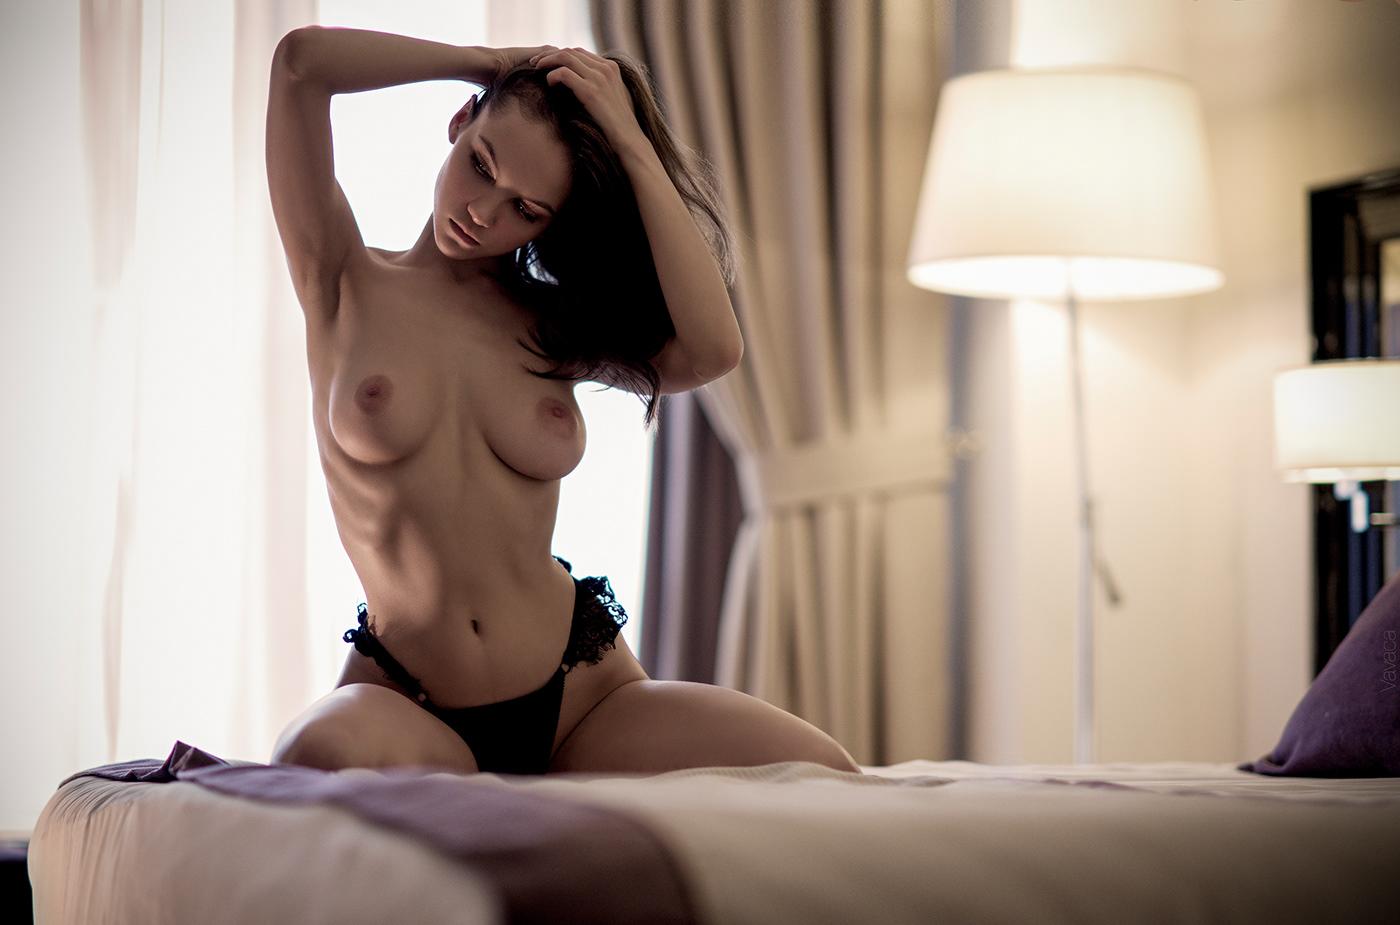 Maria Demina - Vladimir Nikolaev photoshoot